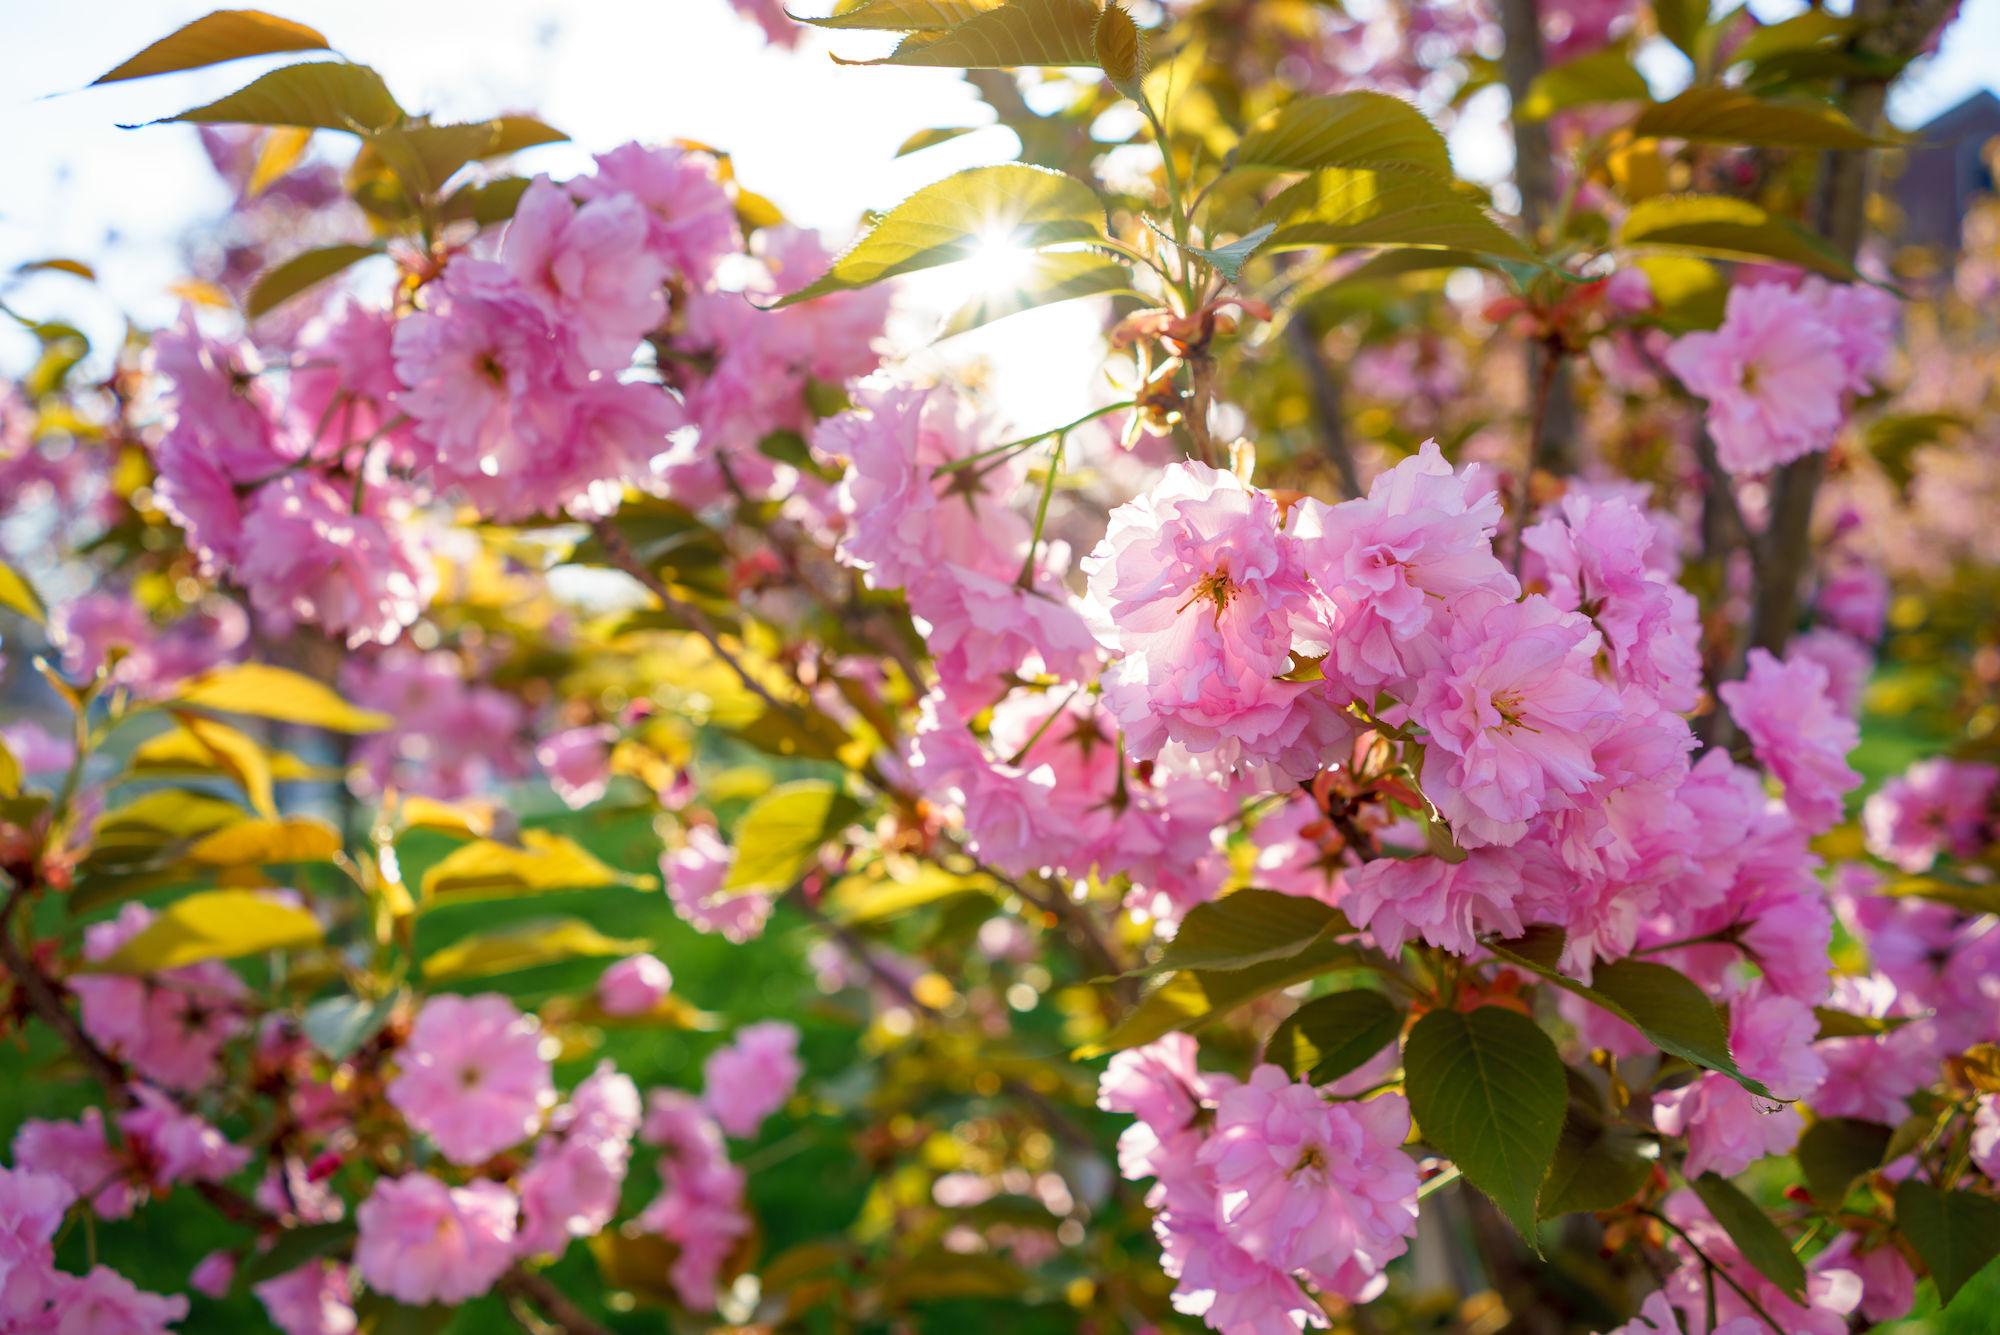 RHIT_Campus_White_Chapel_Cherry_Blossoms-2738.jpg